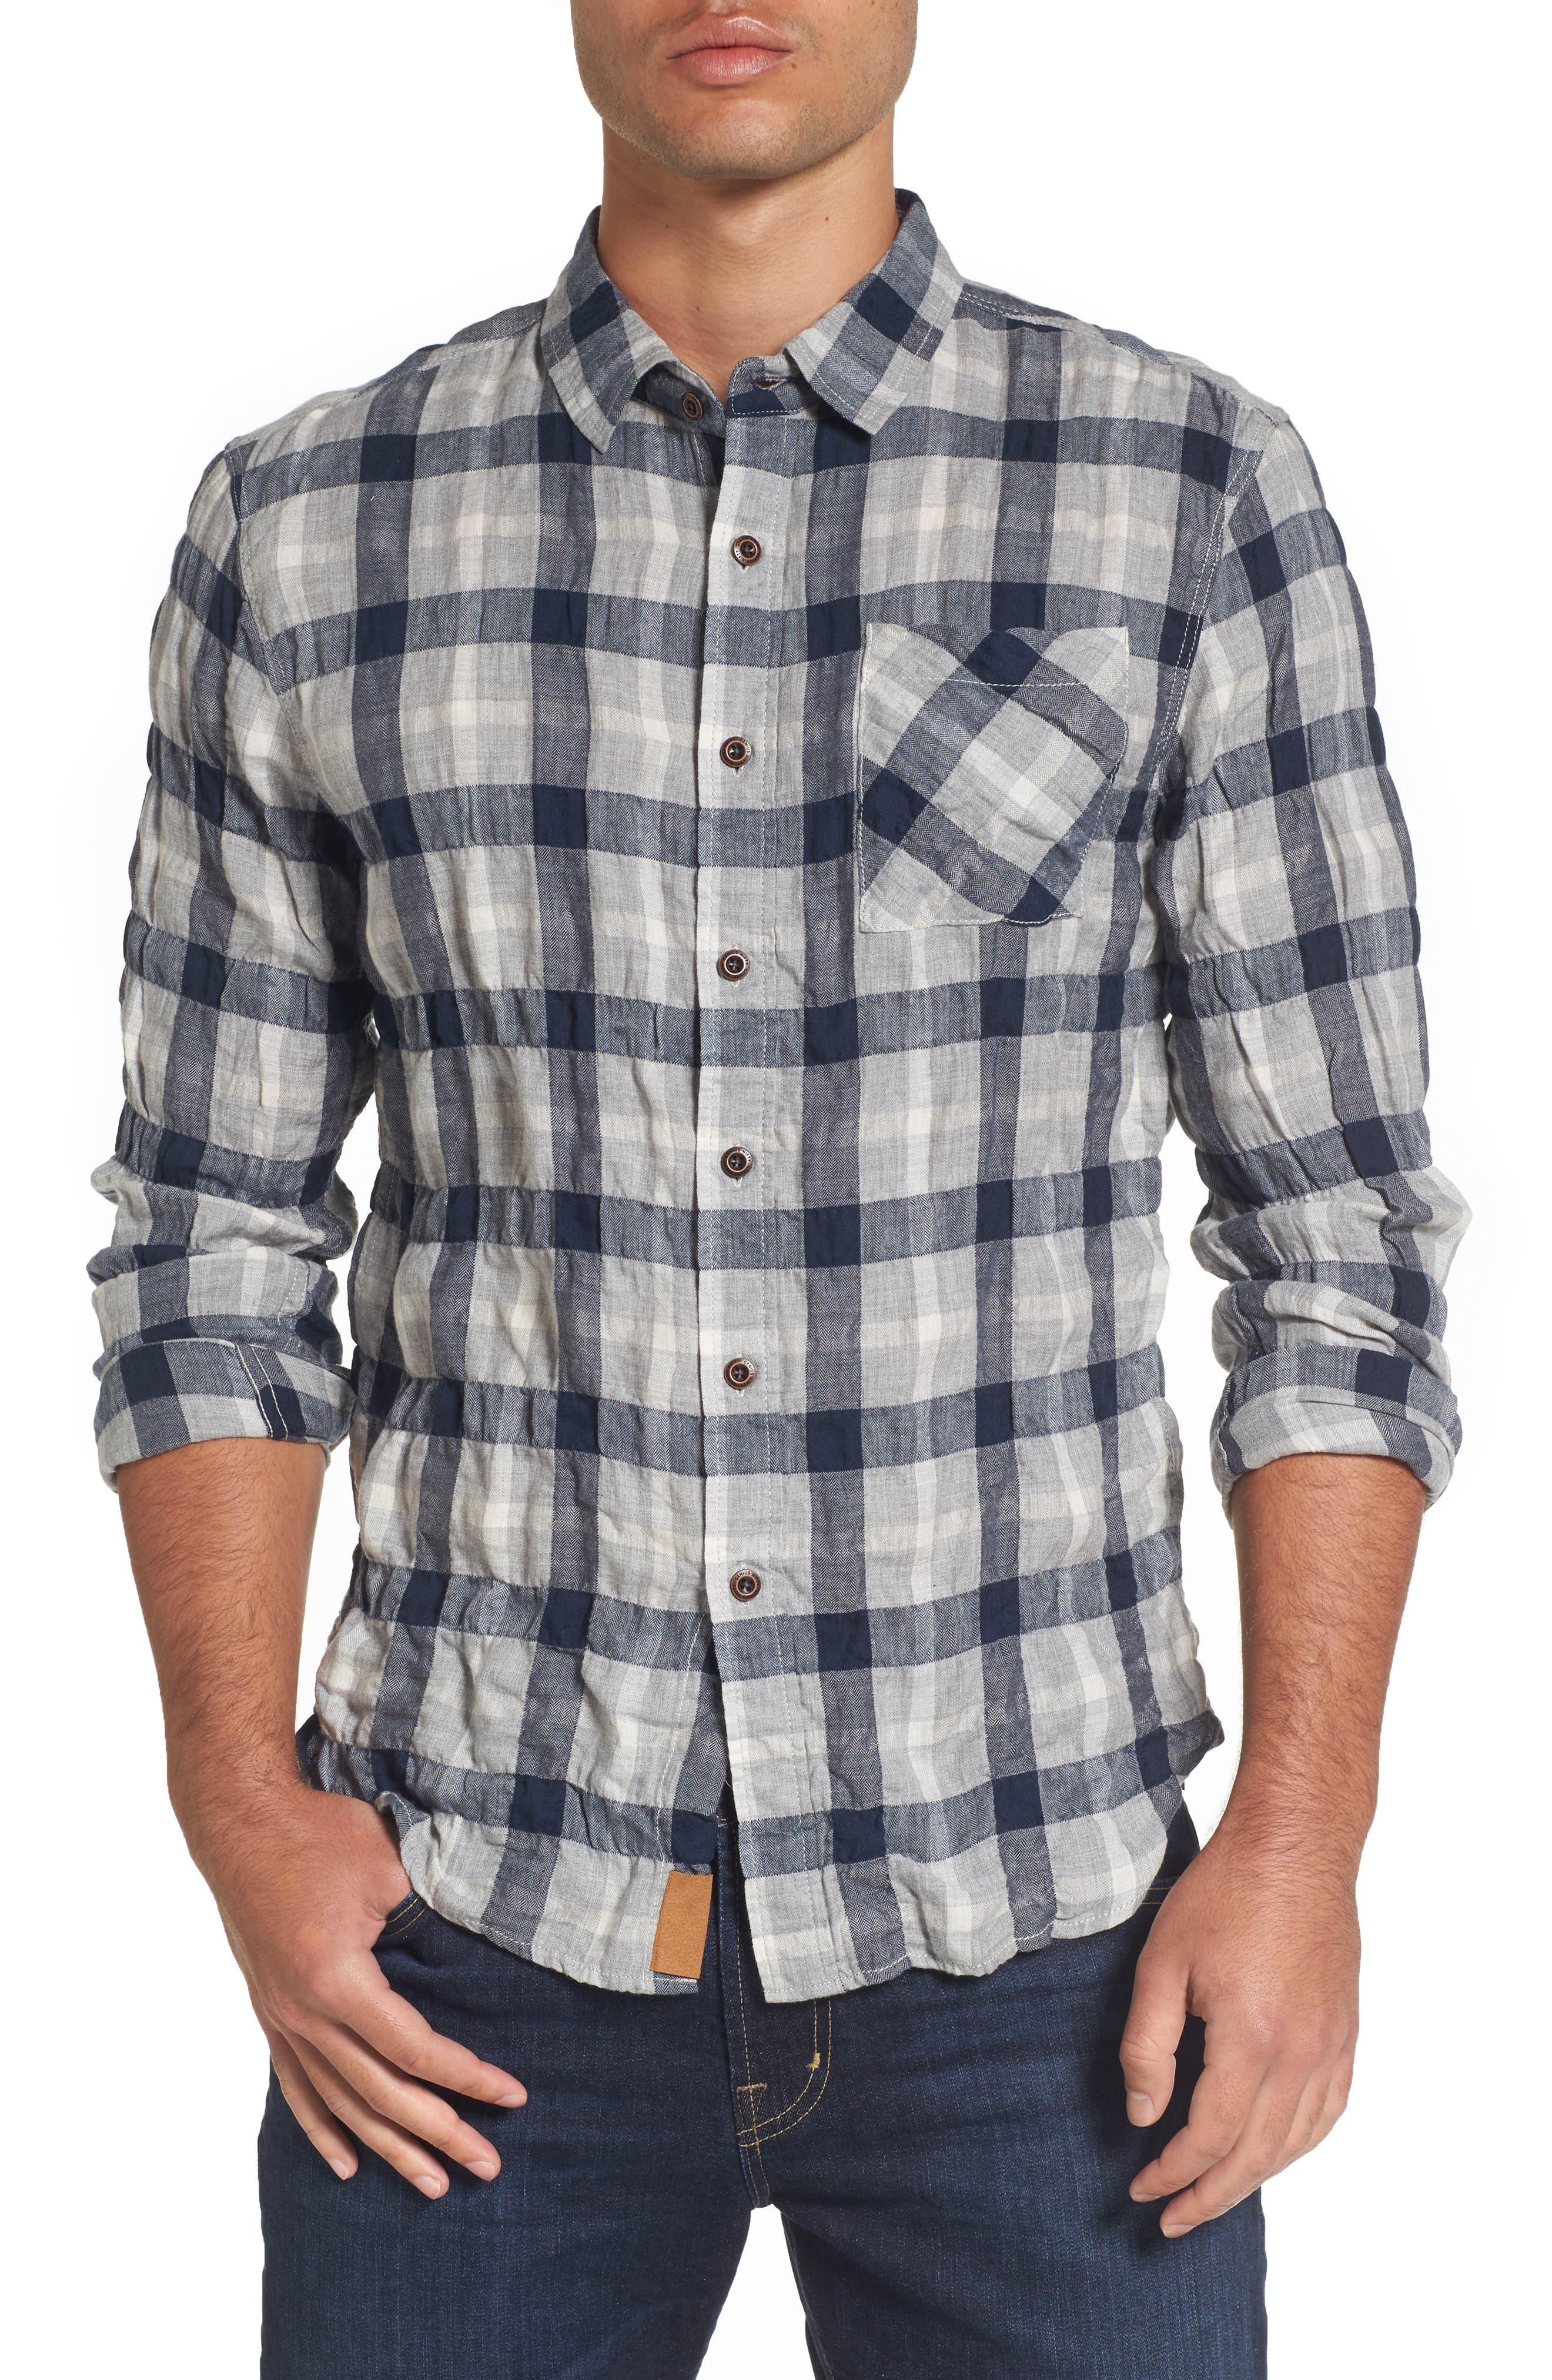 Truman Plaid Sport Shirt,                             Main thumbnail 1, color,                             Gray/ Navy/ White